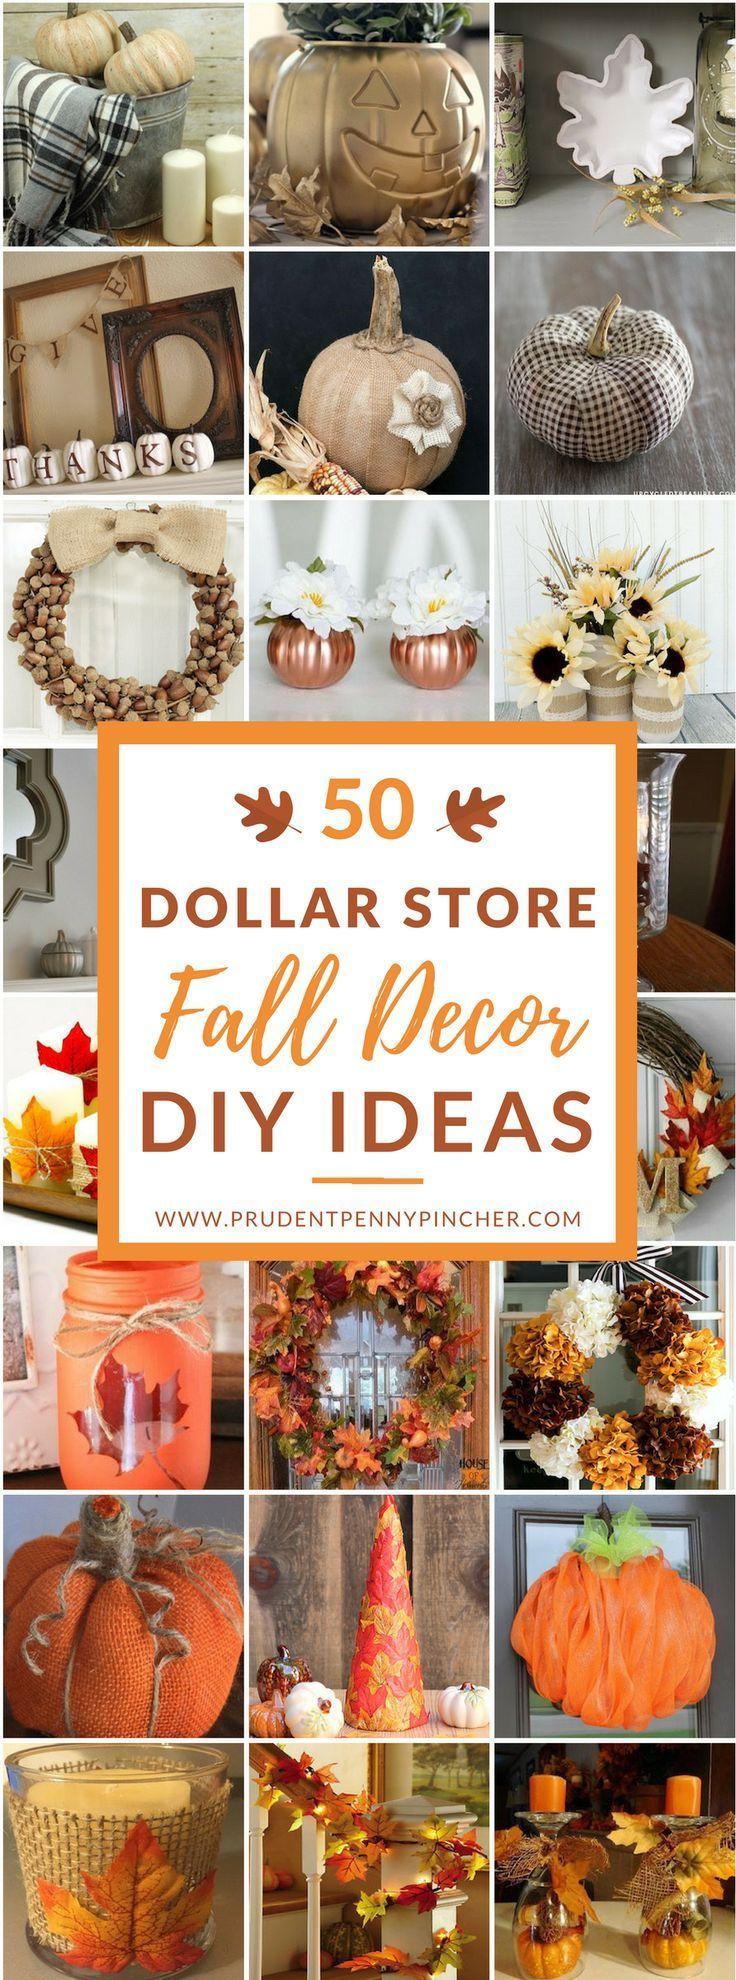 743 tags christmas decorations festival holiday christmas tree views - 50 Dollar Store Fall Decor Diy Ideas